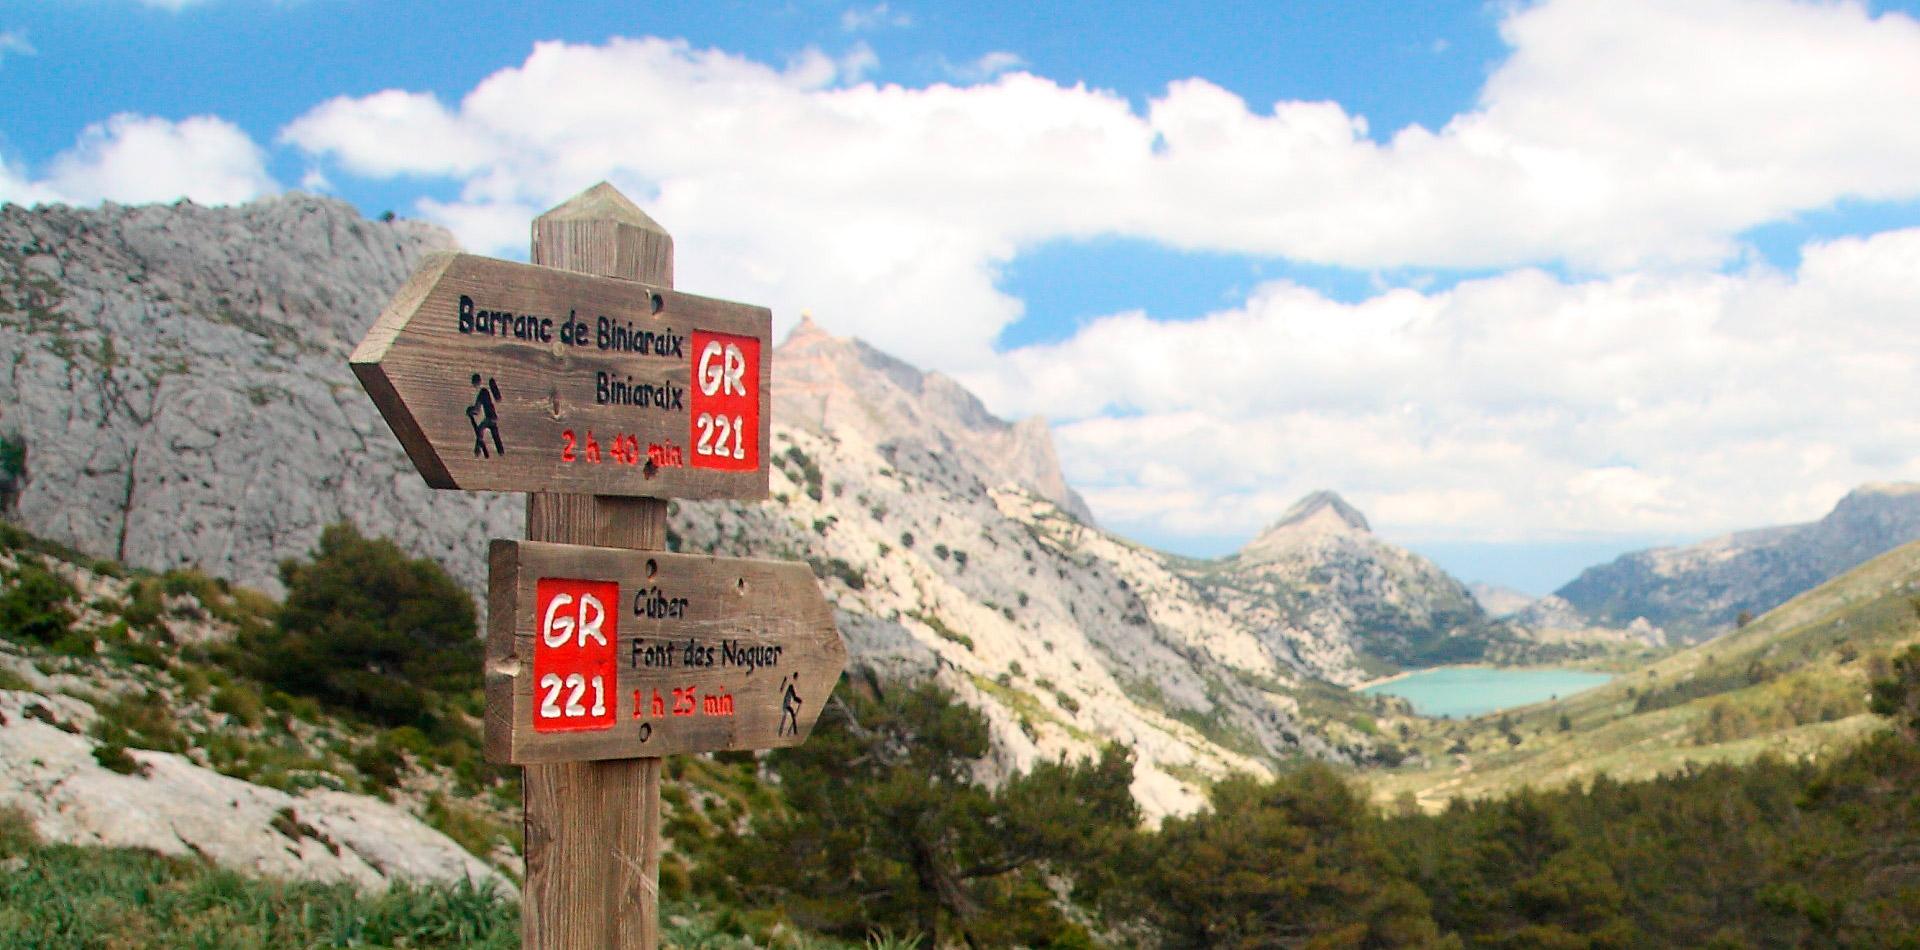 Trekking in Mallorca: GR 221